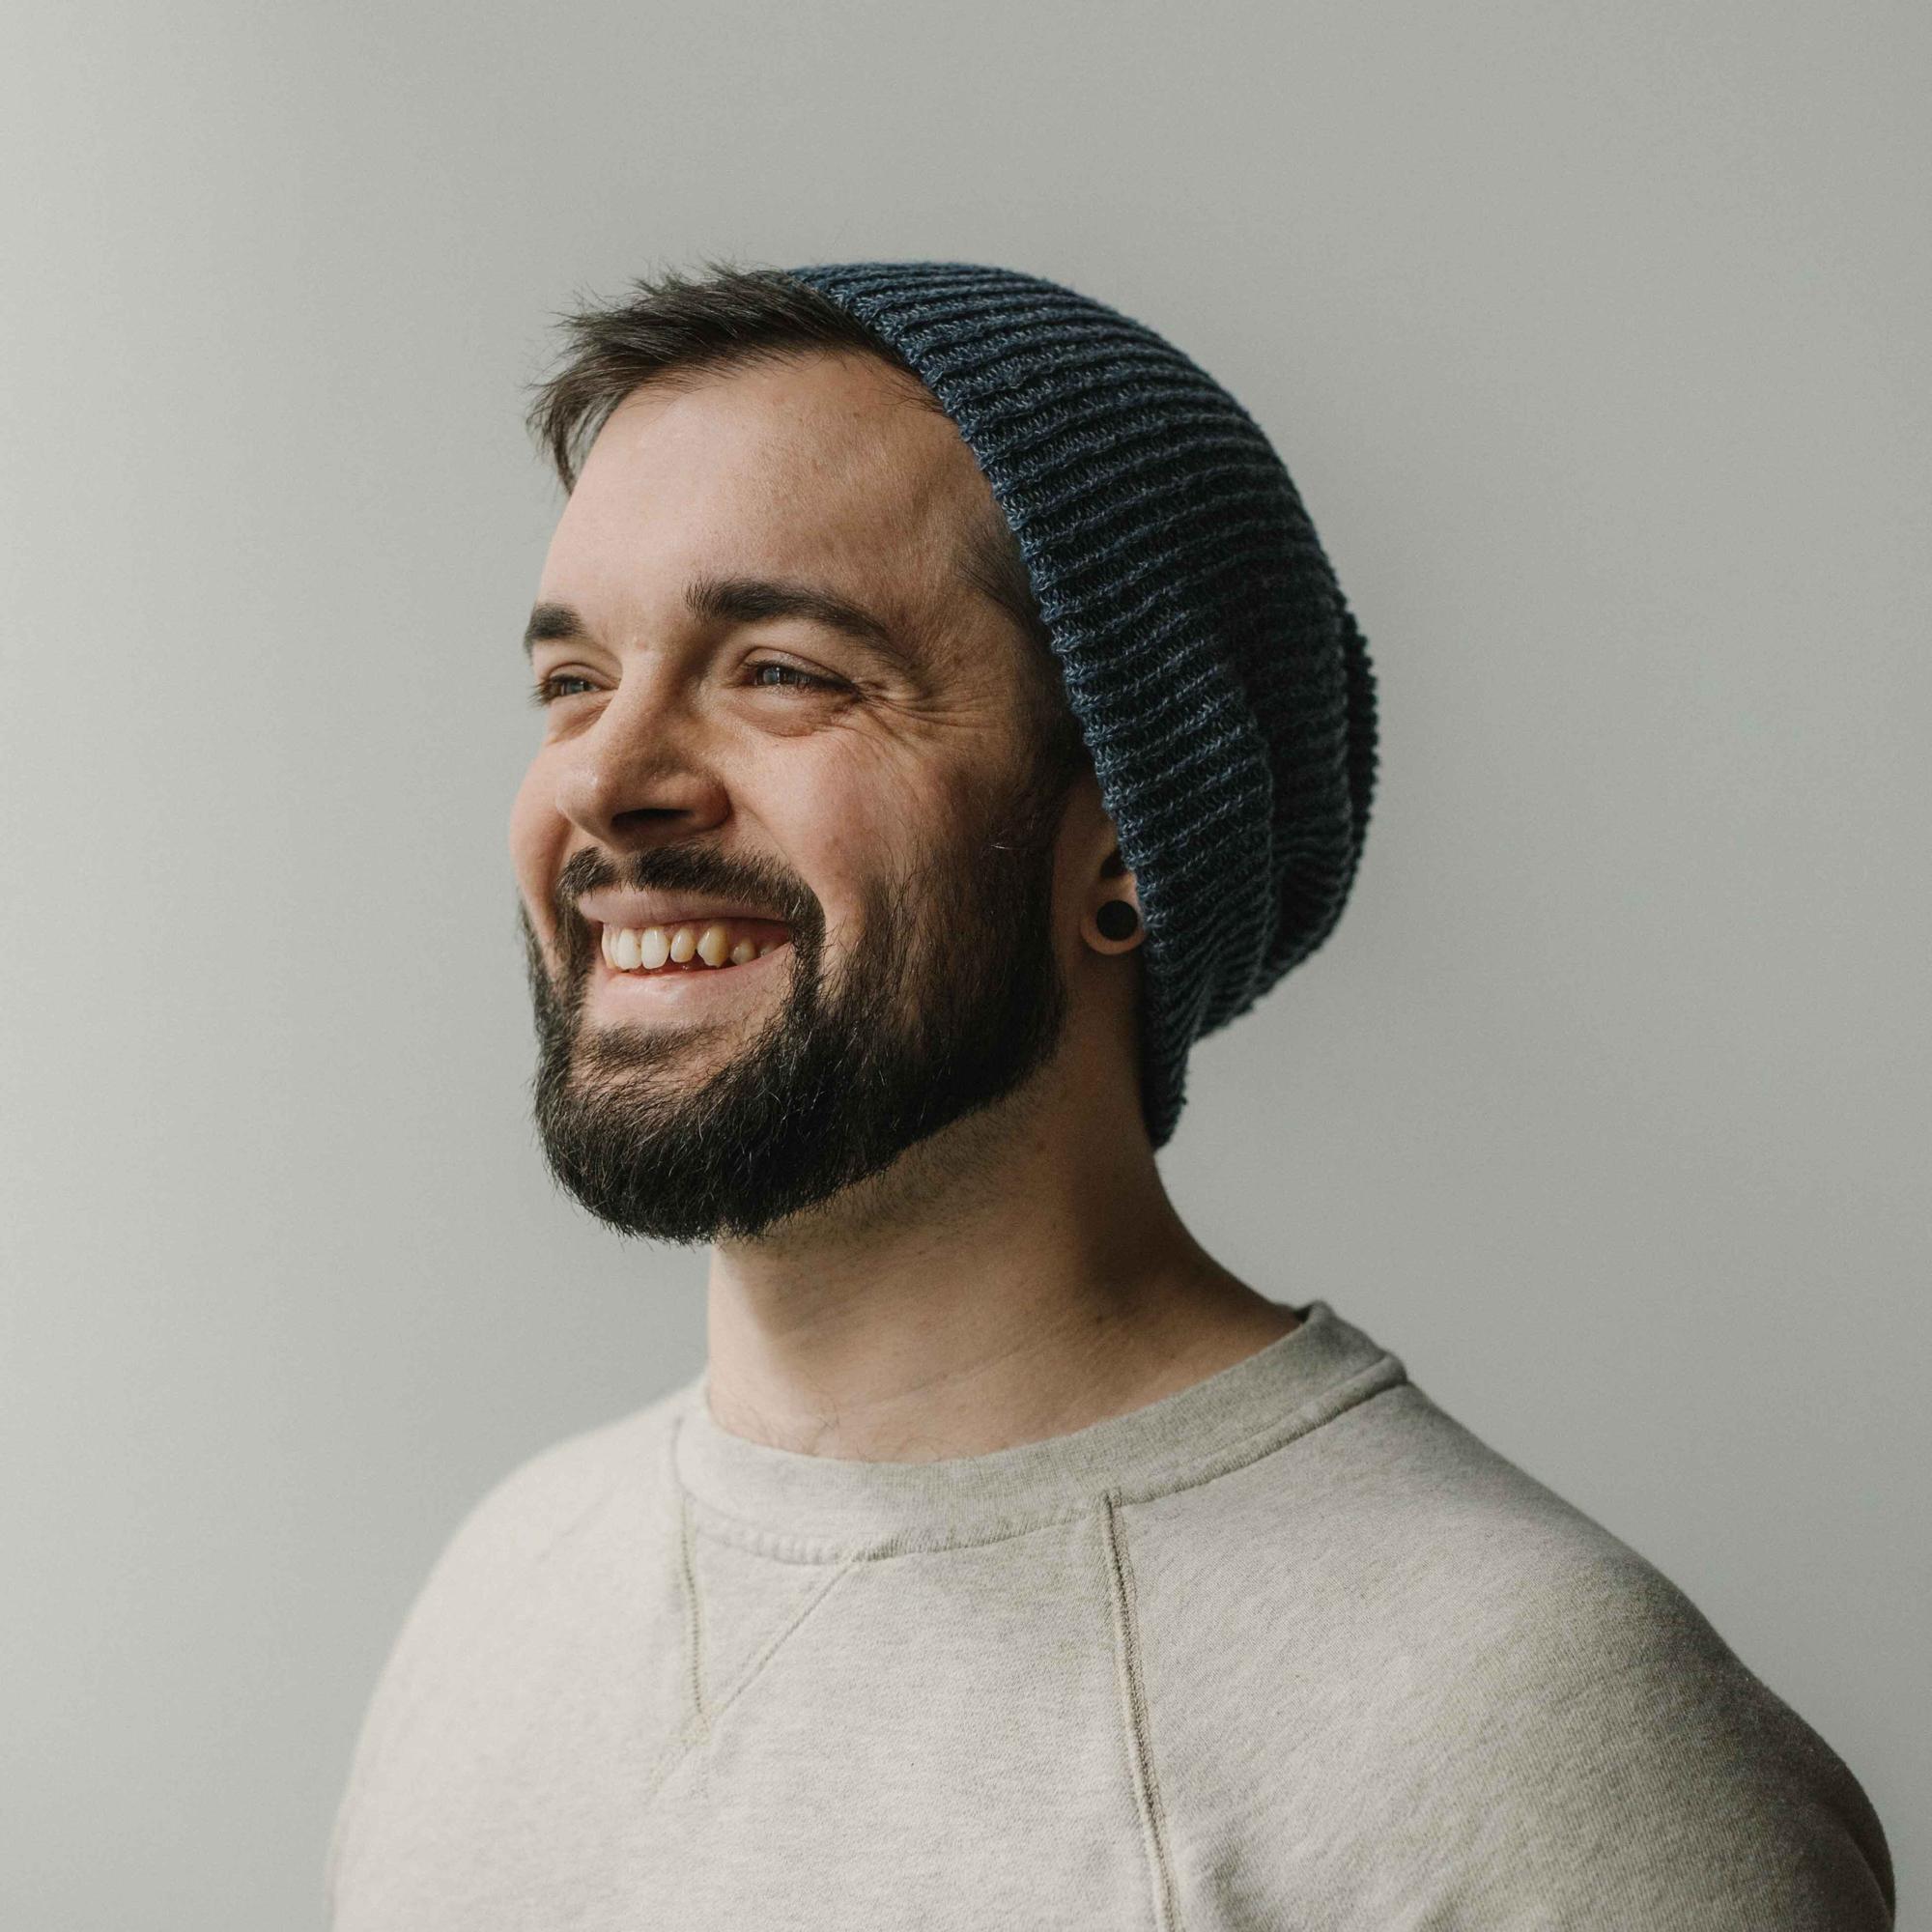 Image of Nick Blackmon